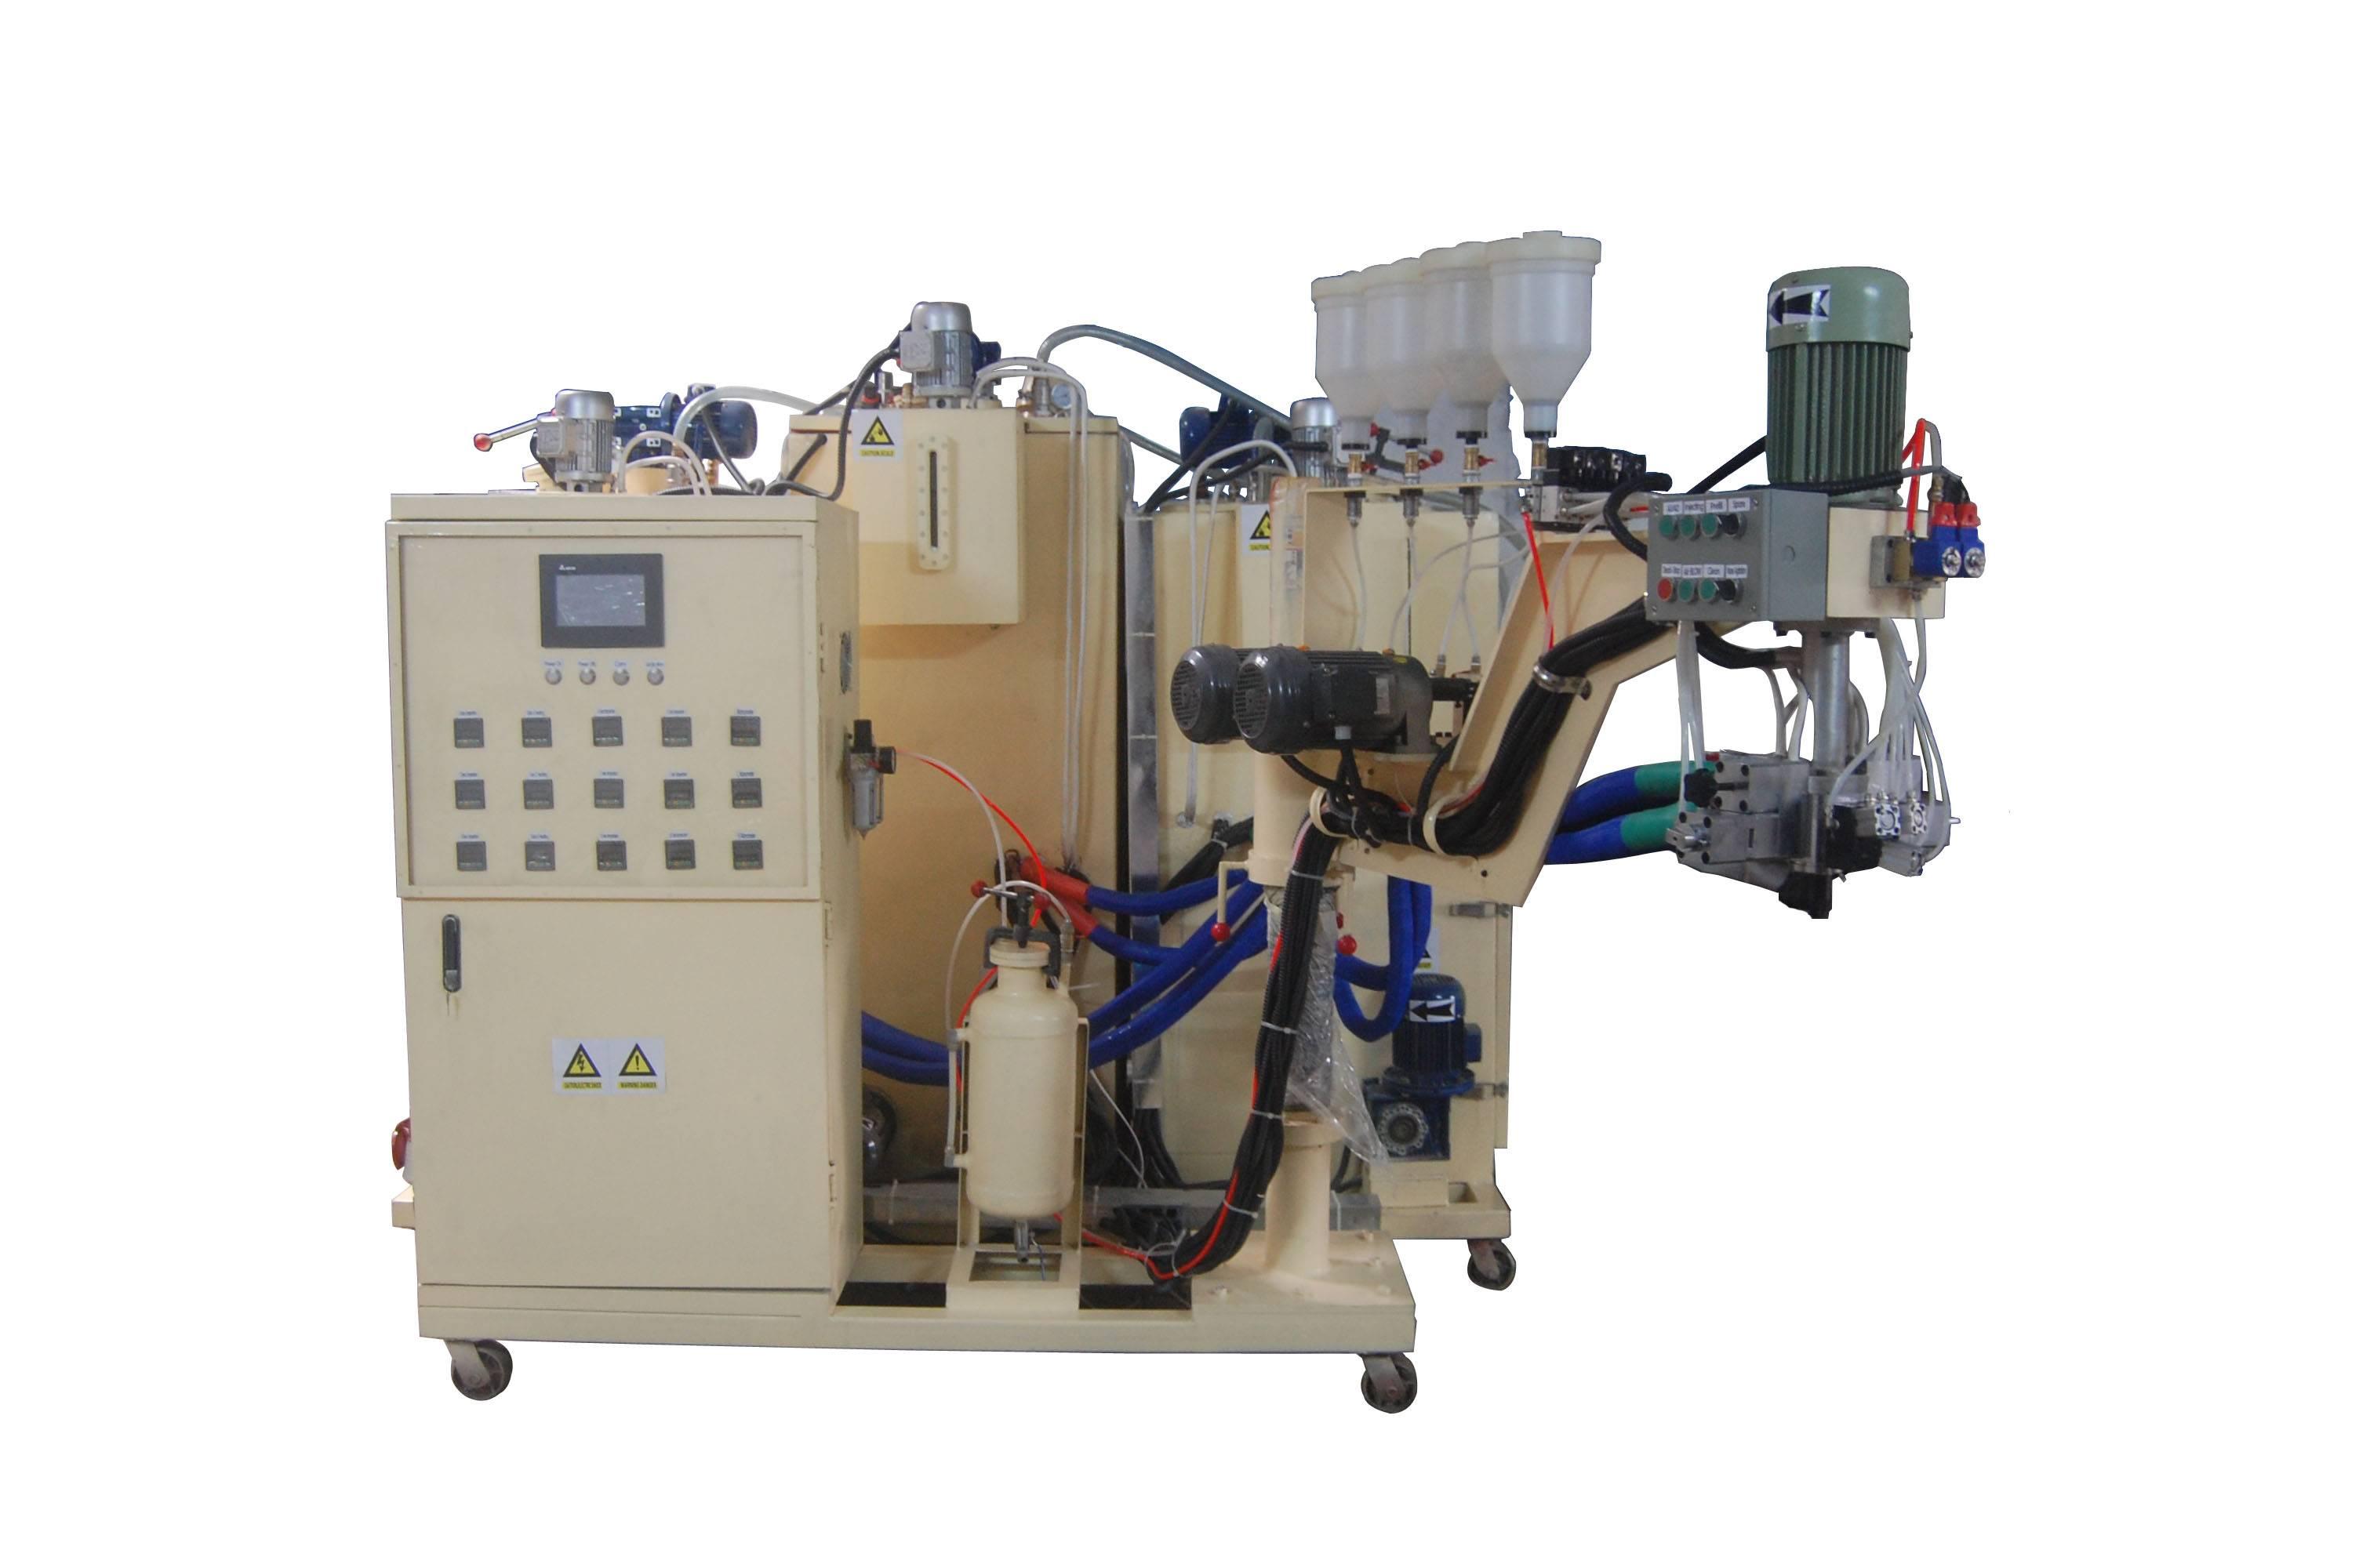 multi fuctional polyurethane foam making machine